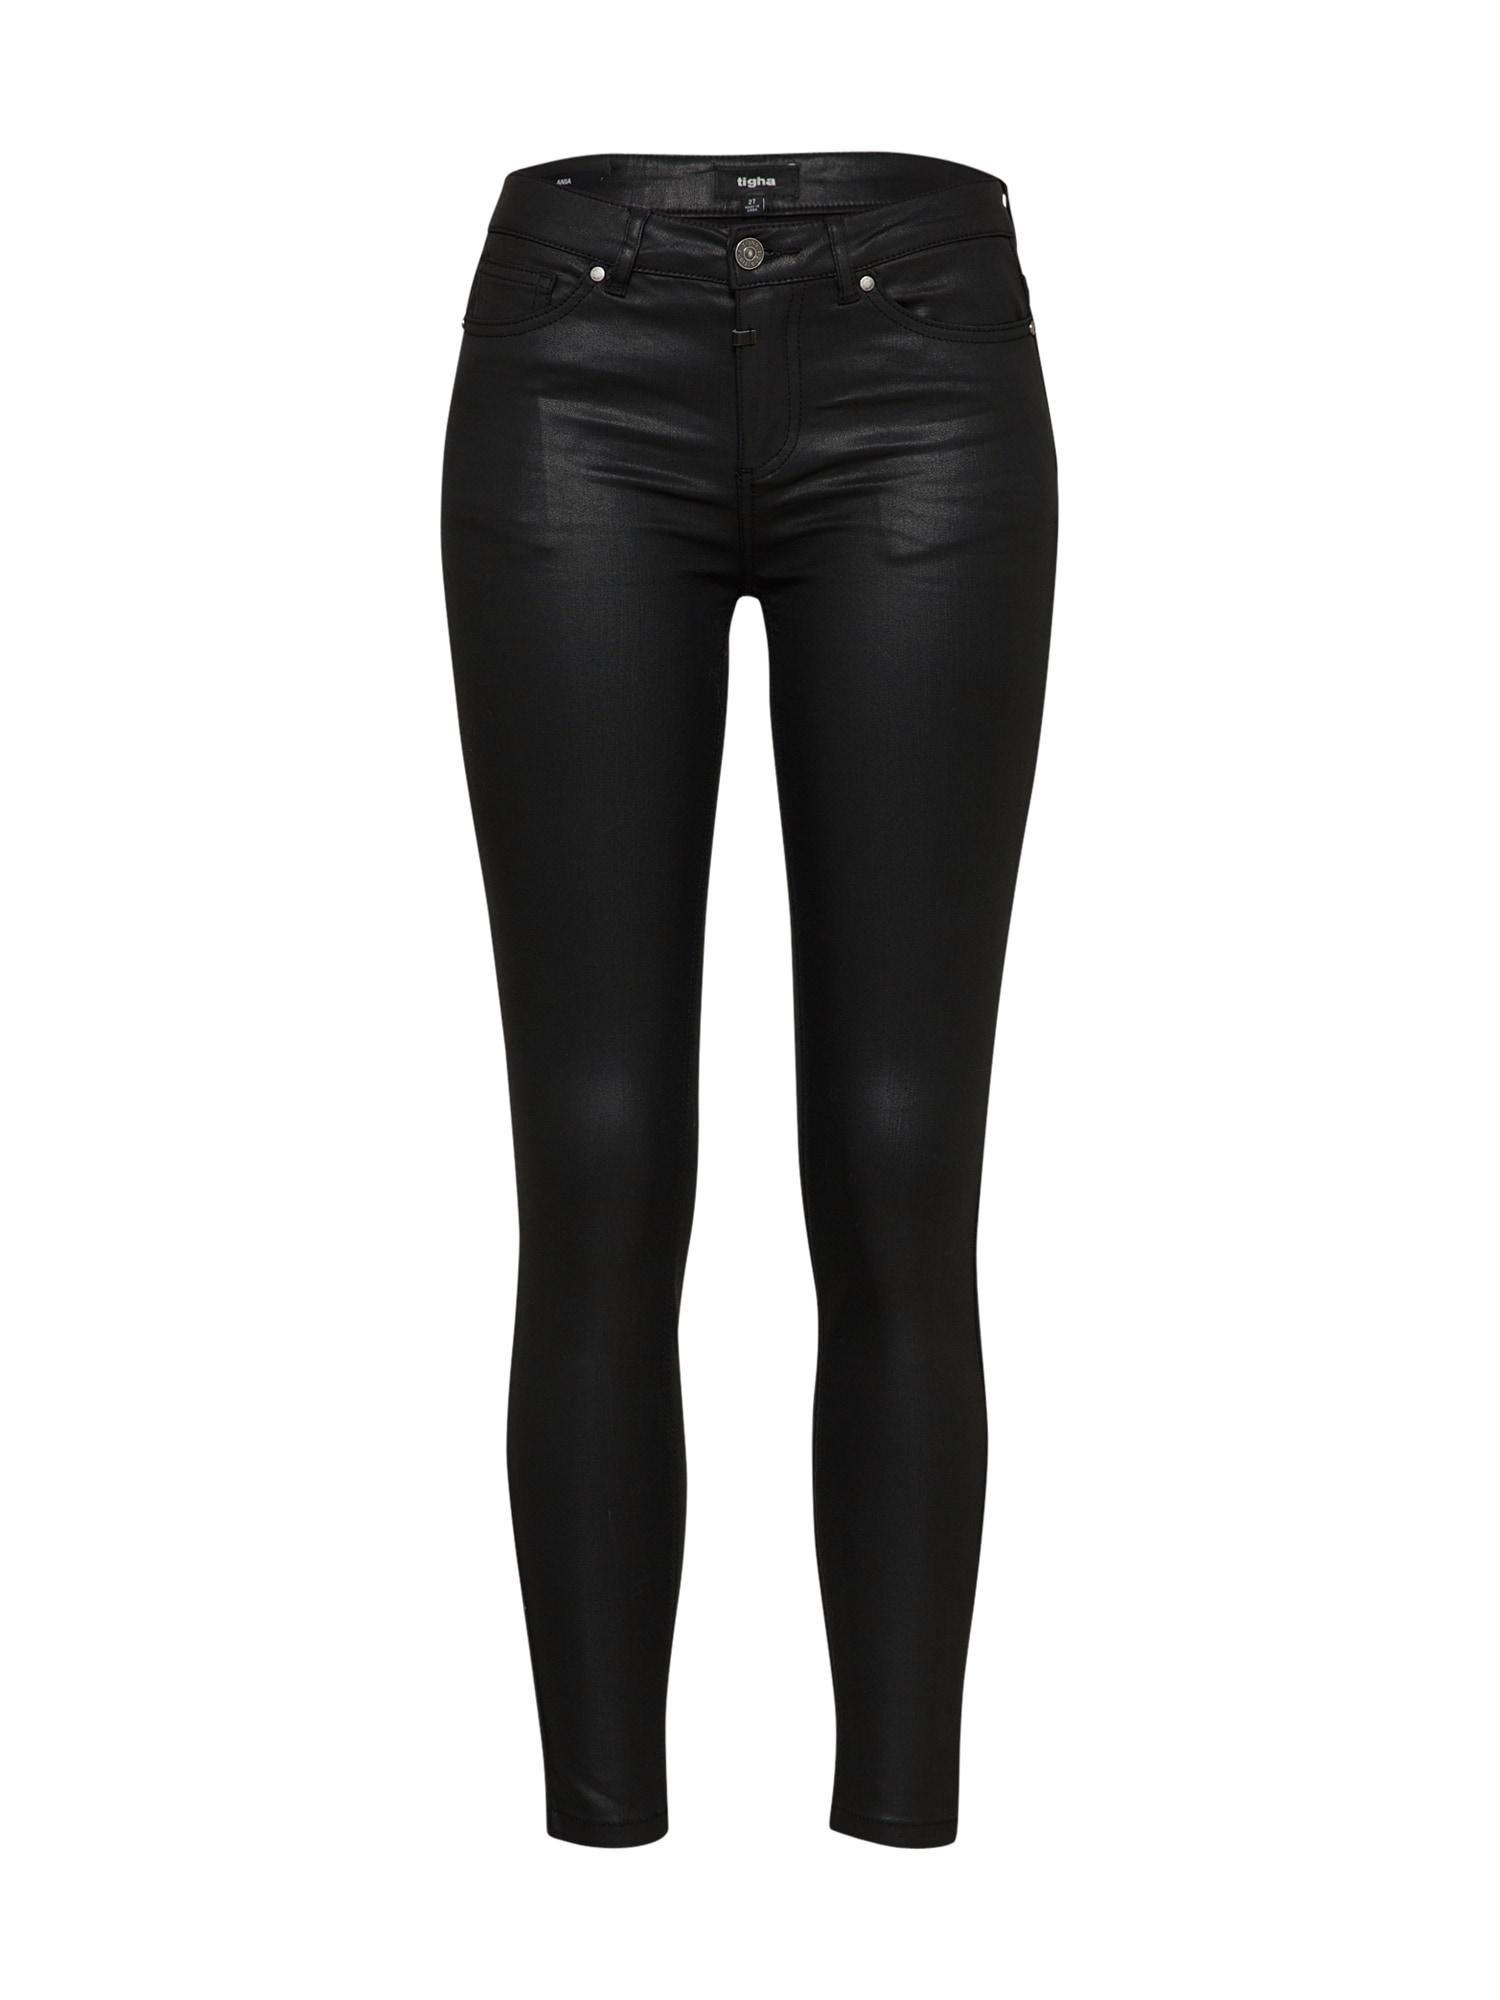 Kalhoty Ania Coated 2 černá Tigha